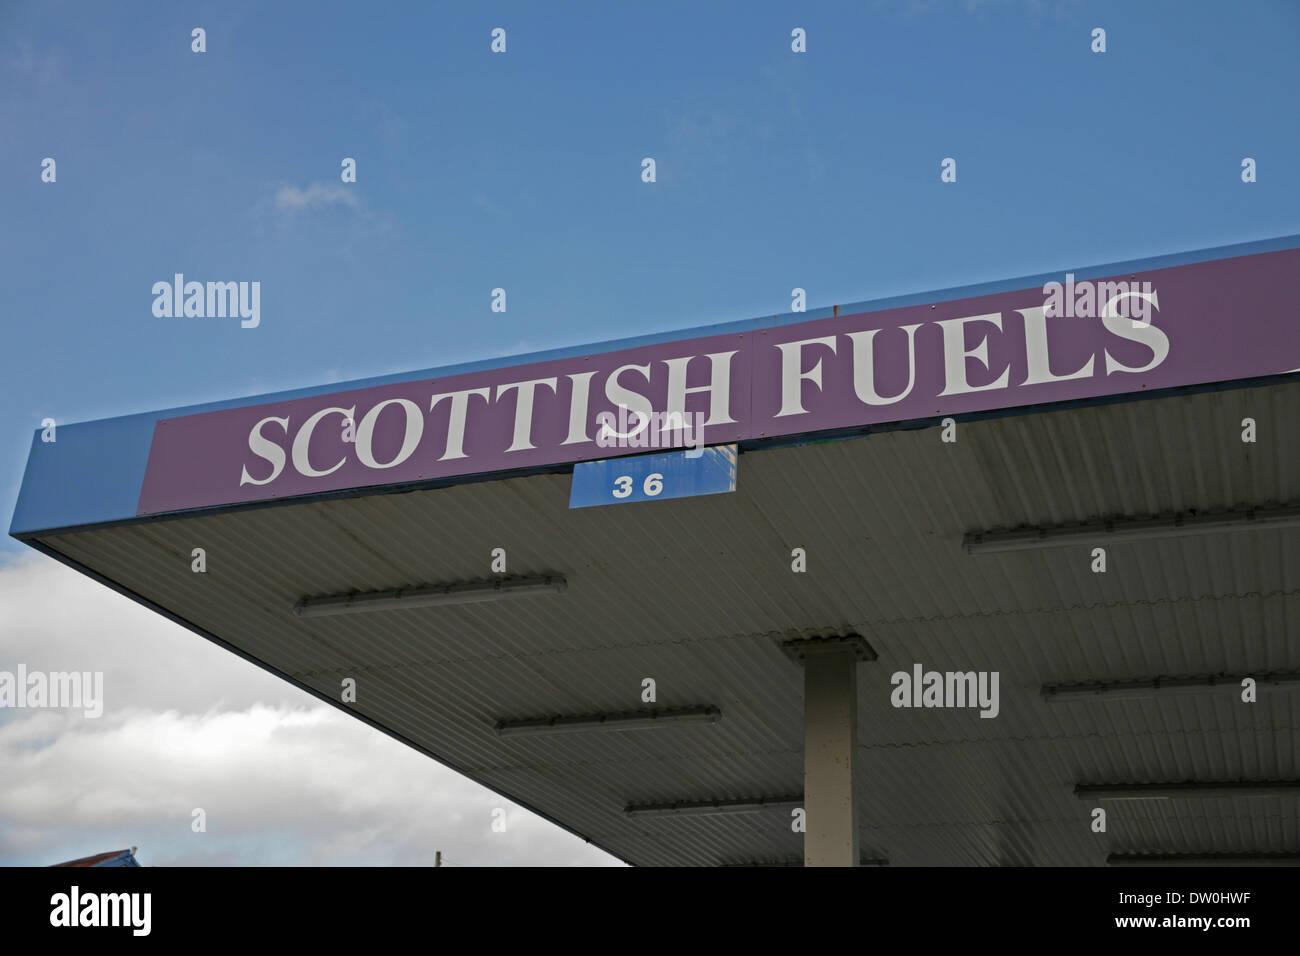 Carrbridge,uk,25th February 2014,Scottish fuels sign in Carrbridge Scotland ©Keith Larby Stock Photo